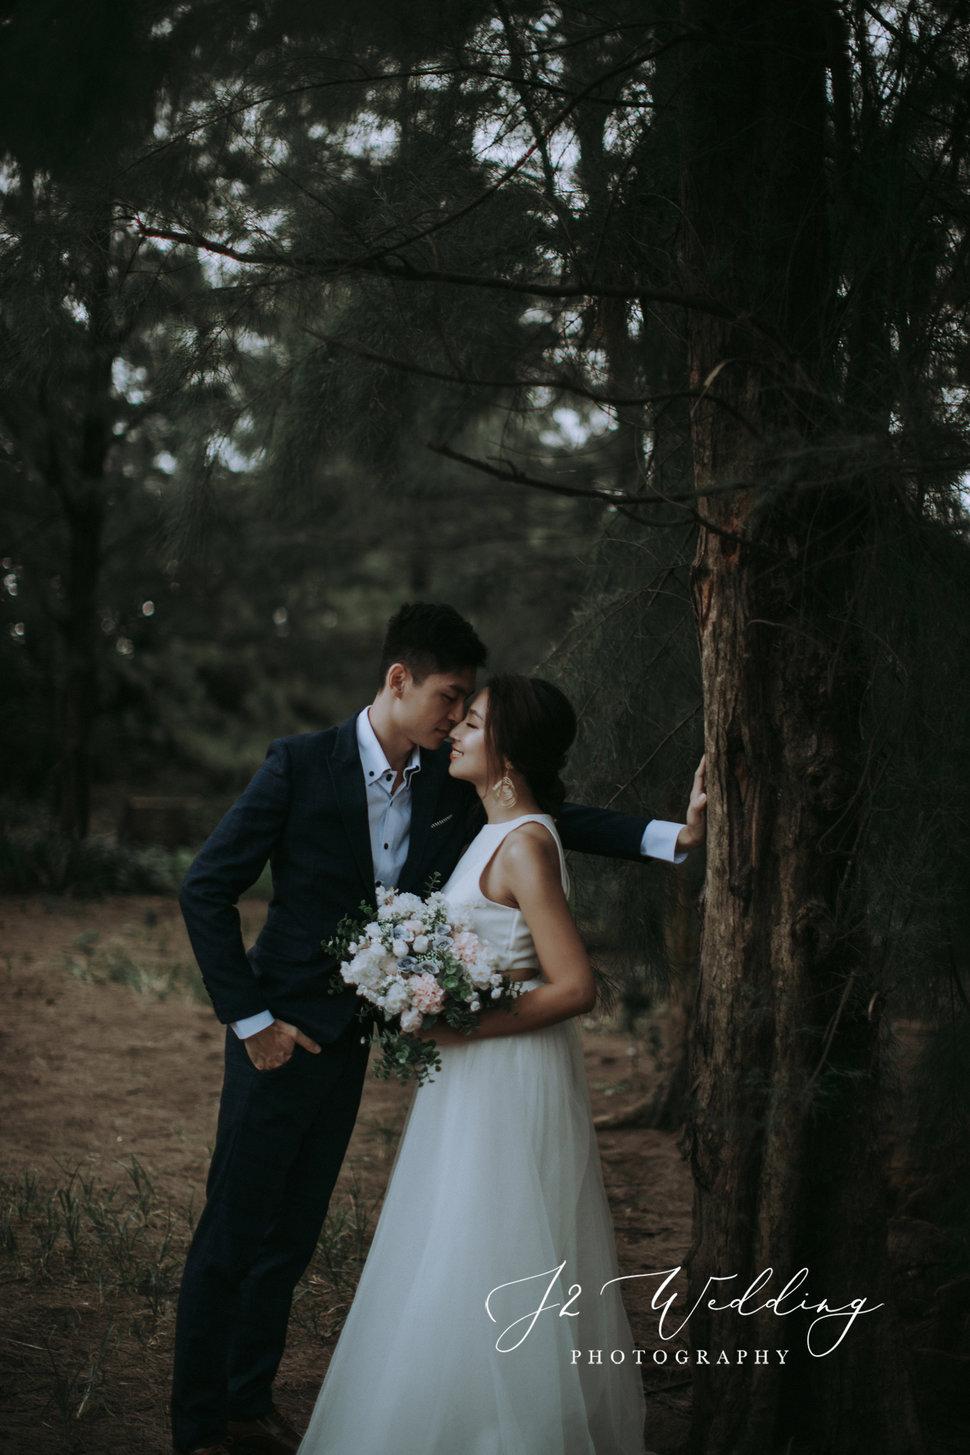 069A1270 - J2 wedding 中壢《結婚吧》